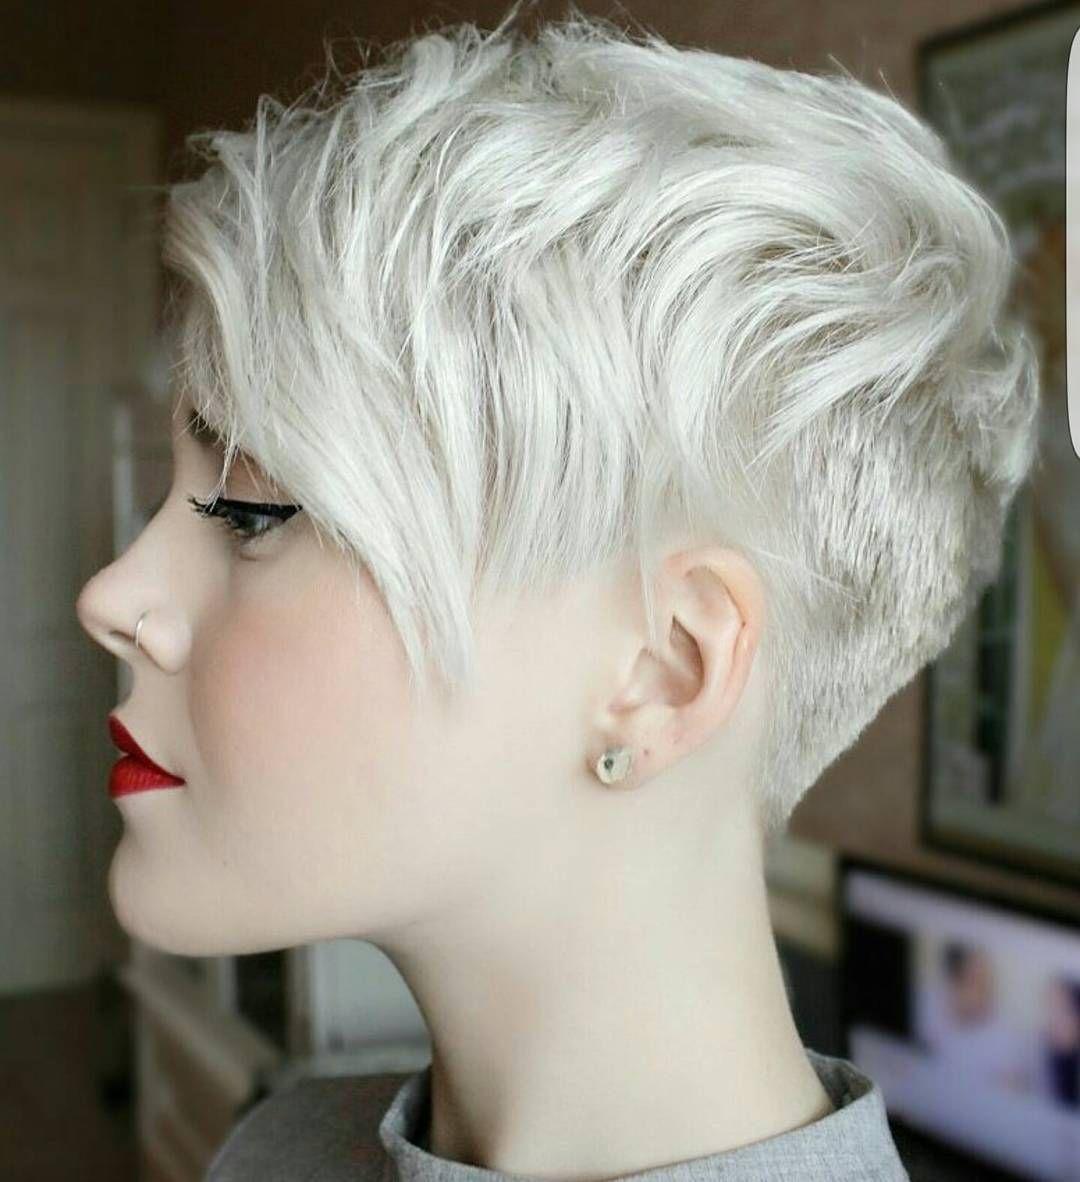 Fiidnt short hairstyles on instagram ucdo u love this new fresh cut